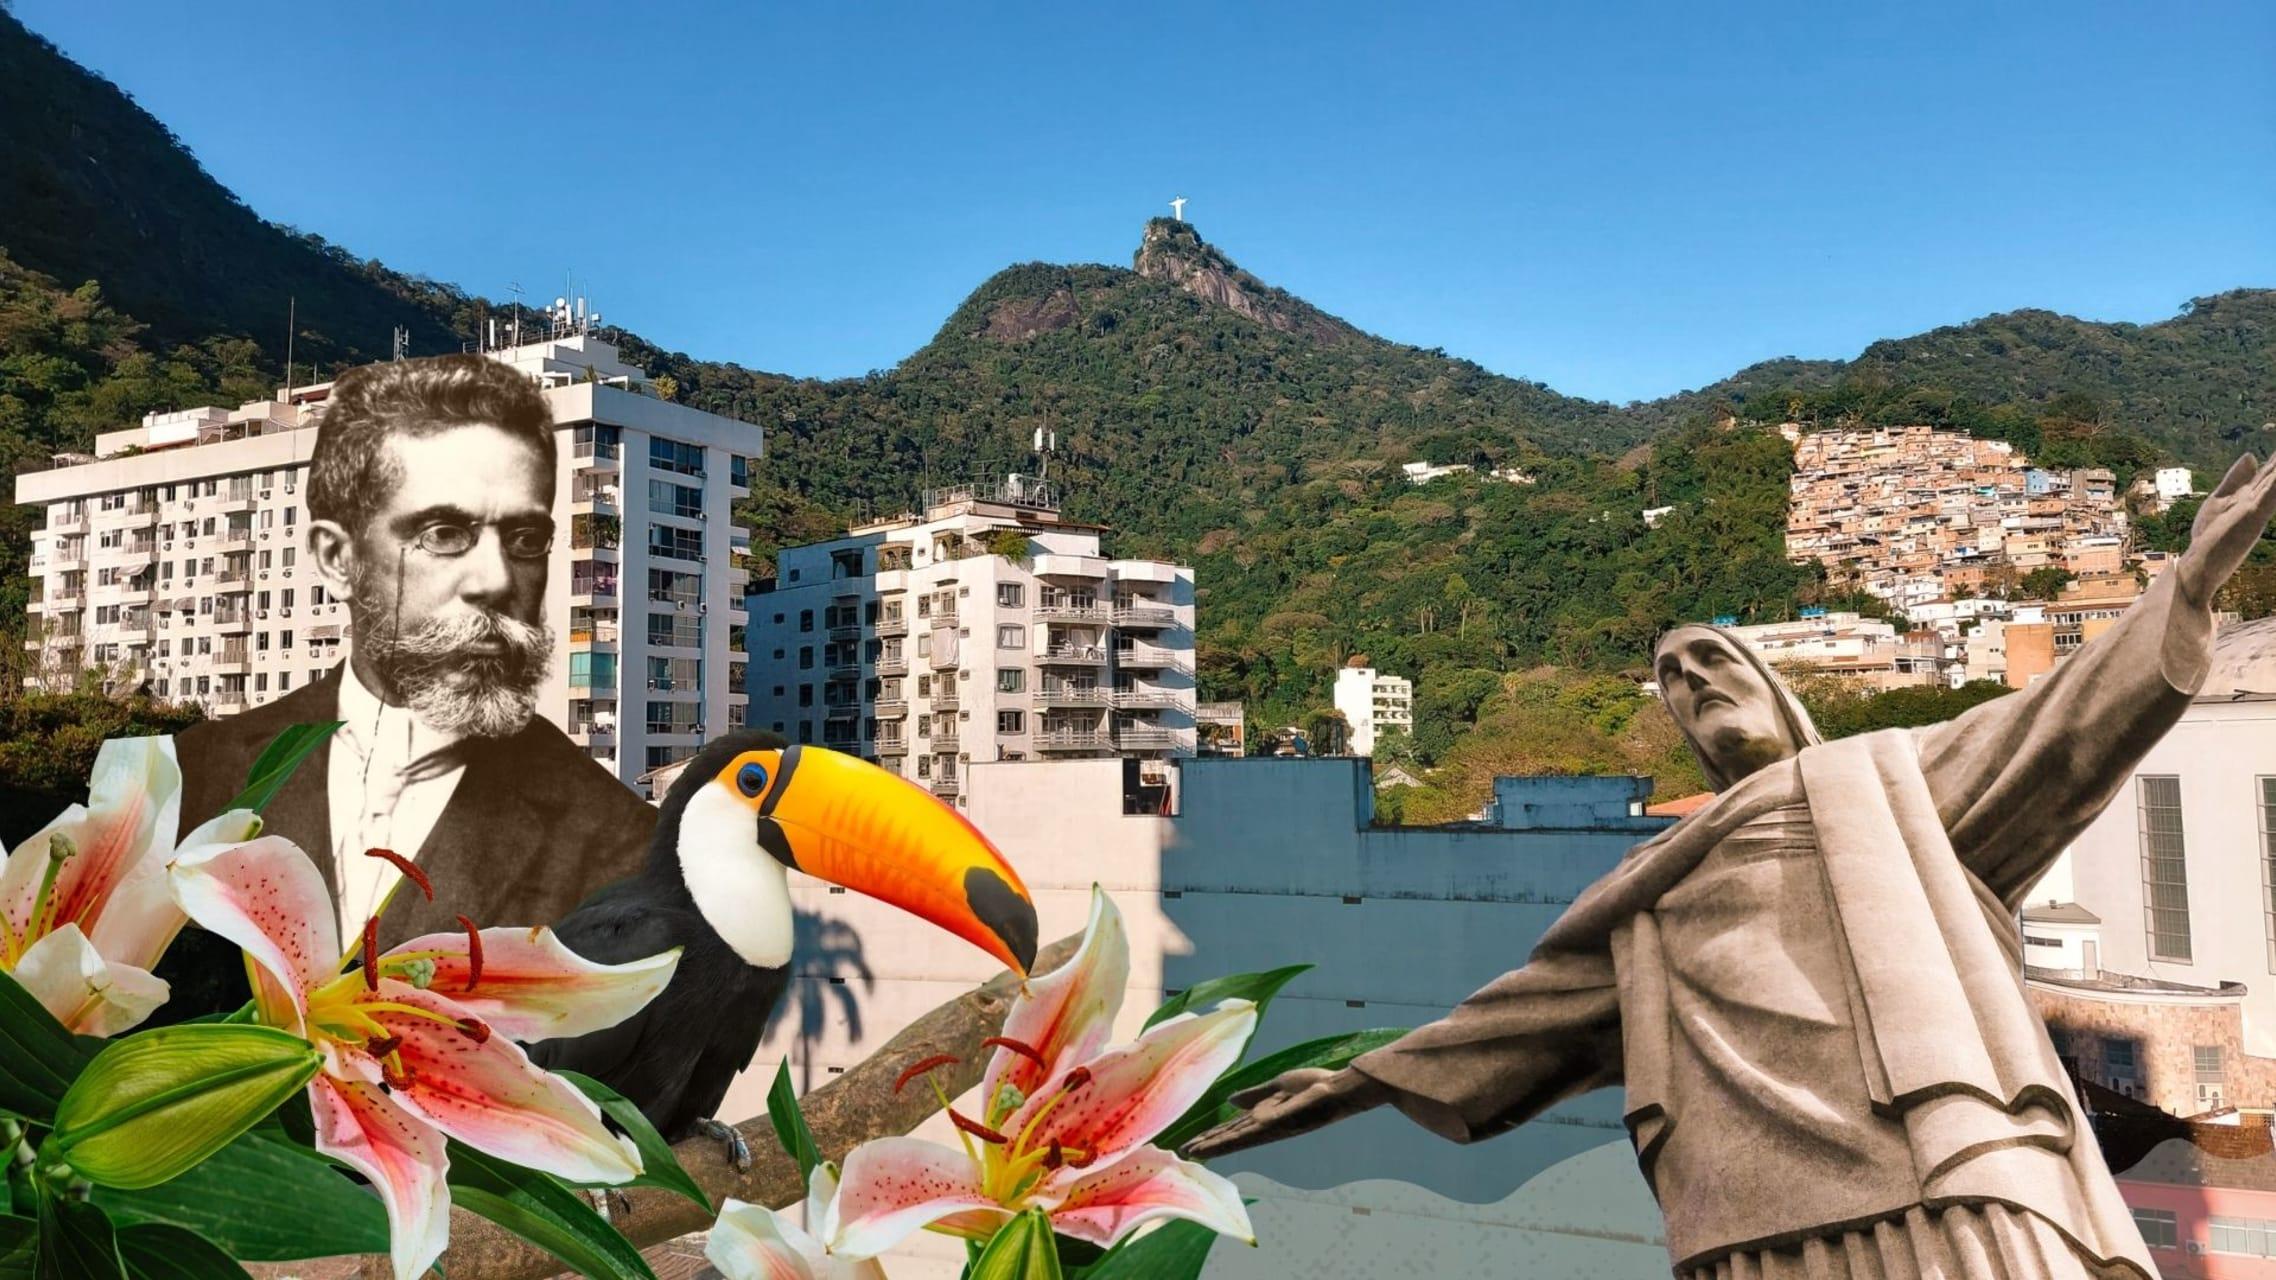 Rio de Janeiro - Treasures Under the Arms of Christ the Redeemer